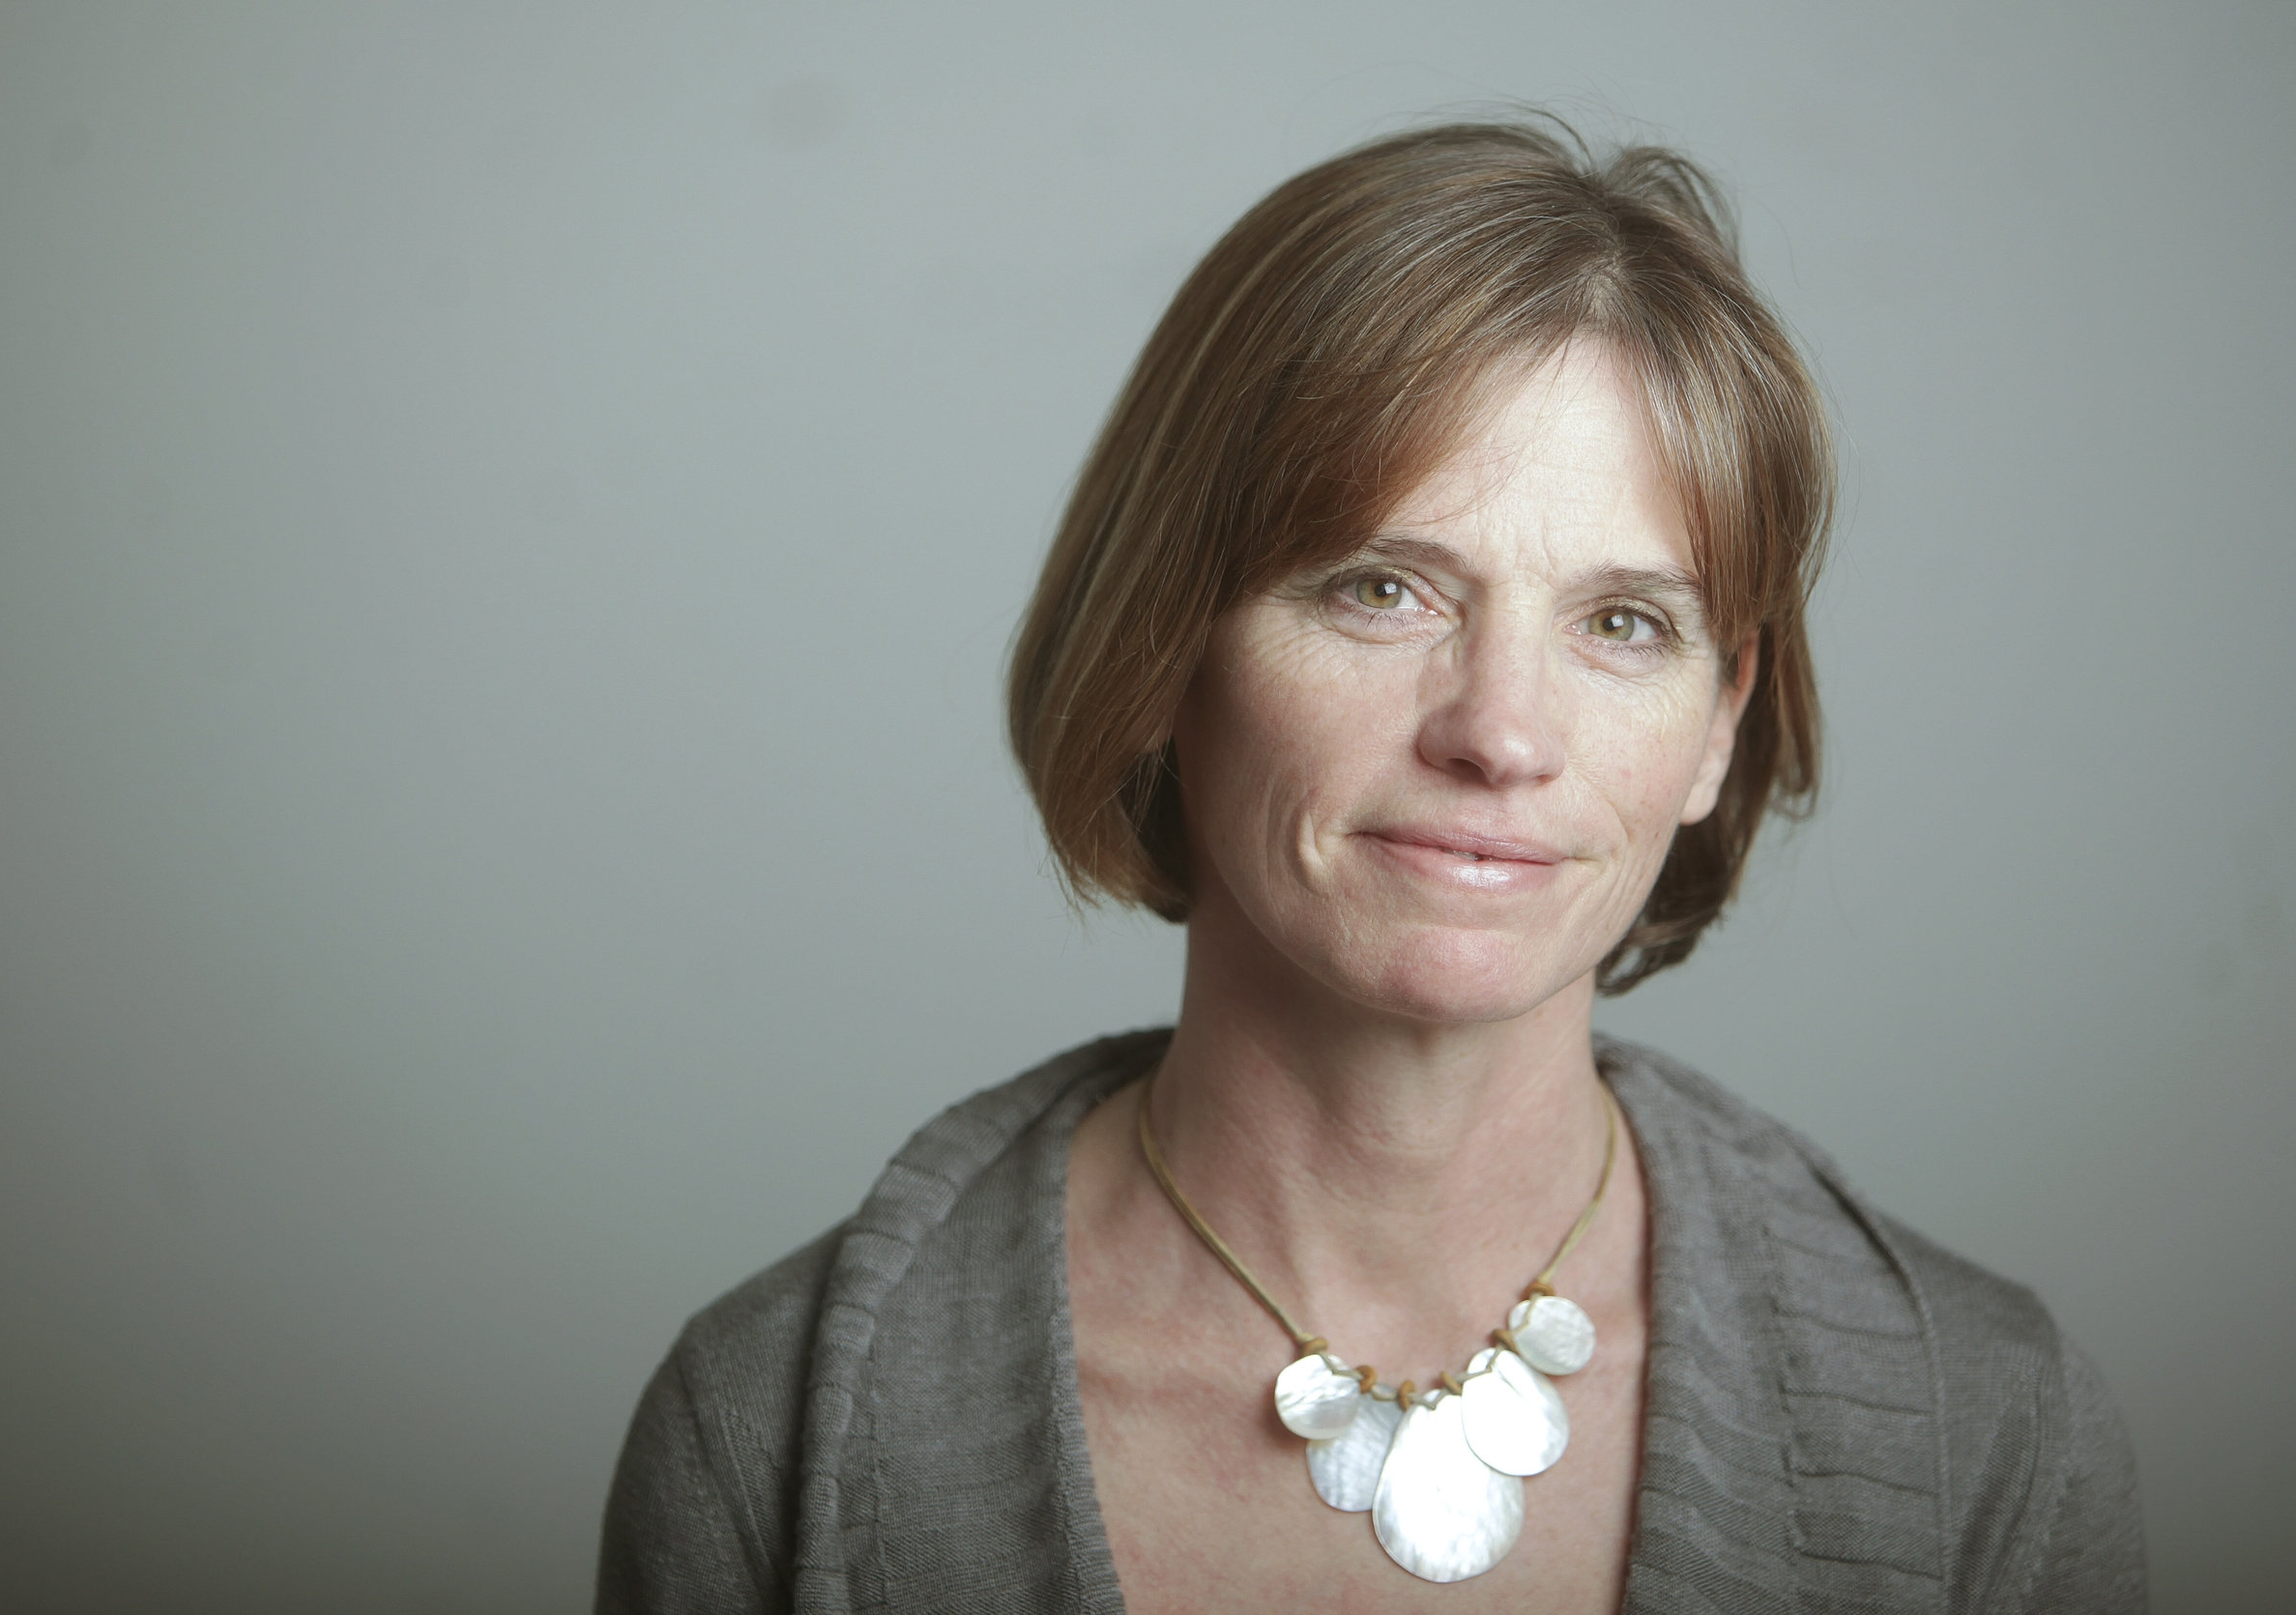 Sarah Hemming